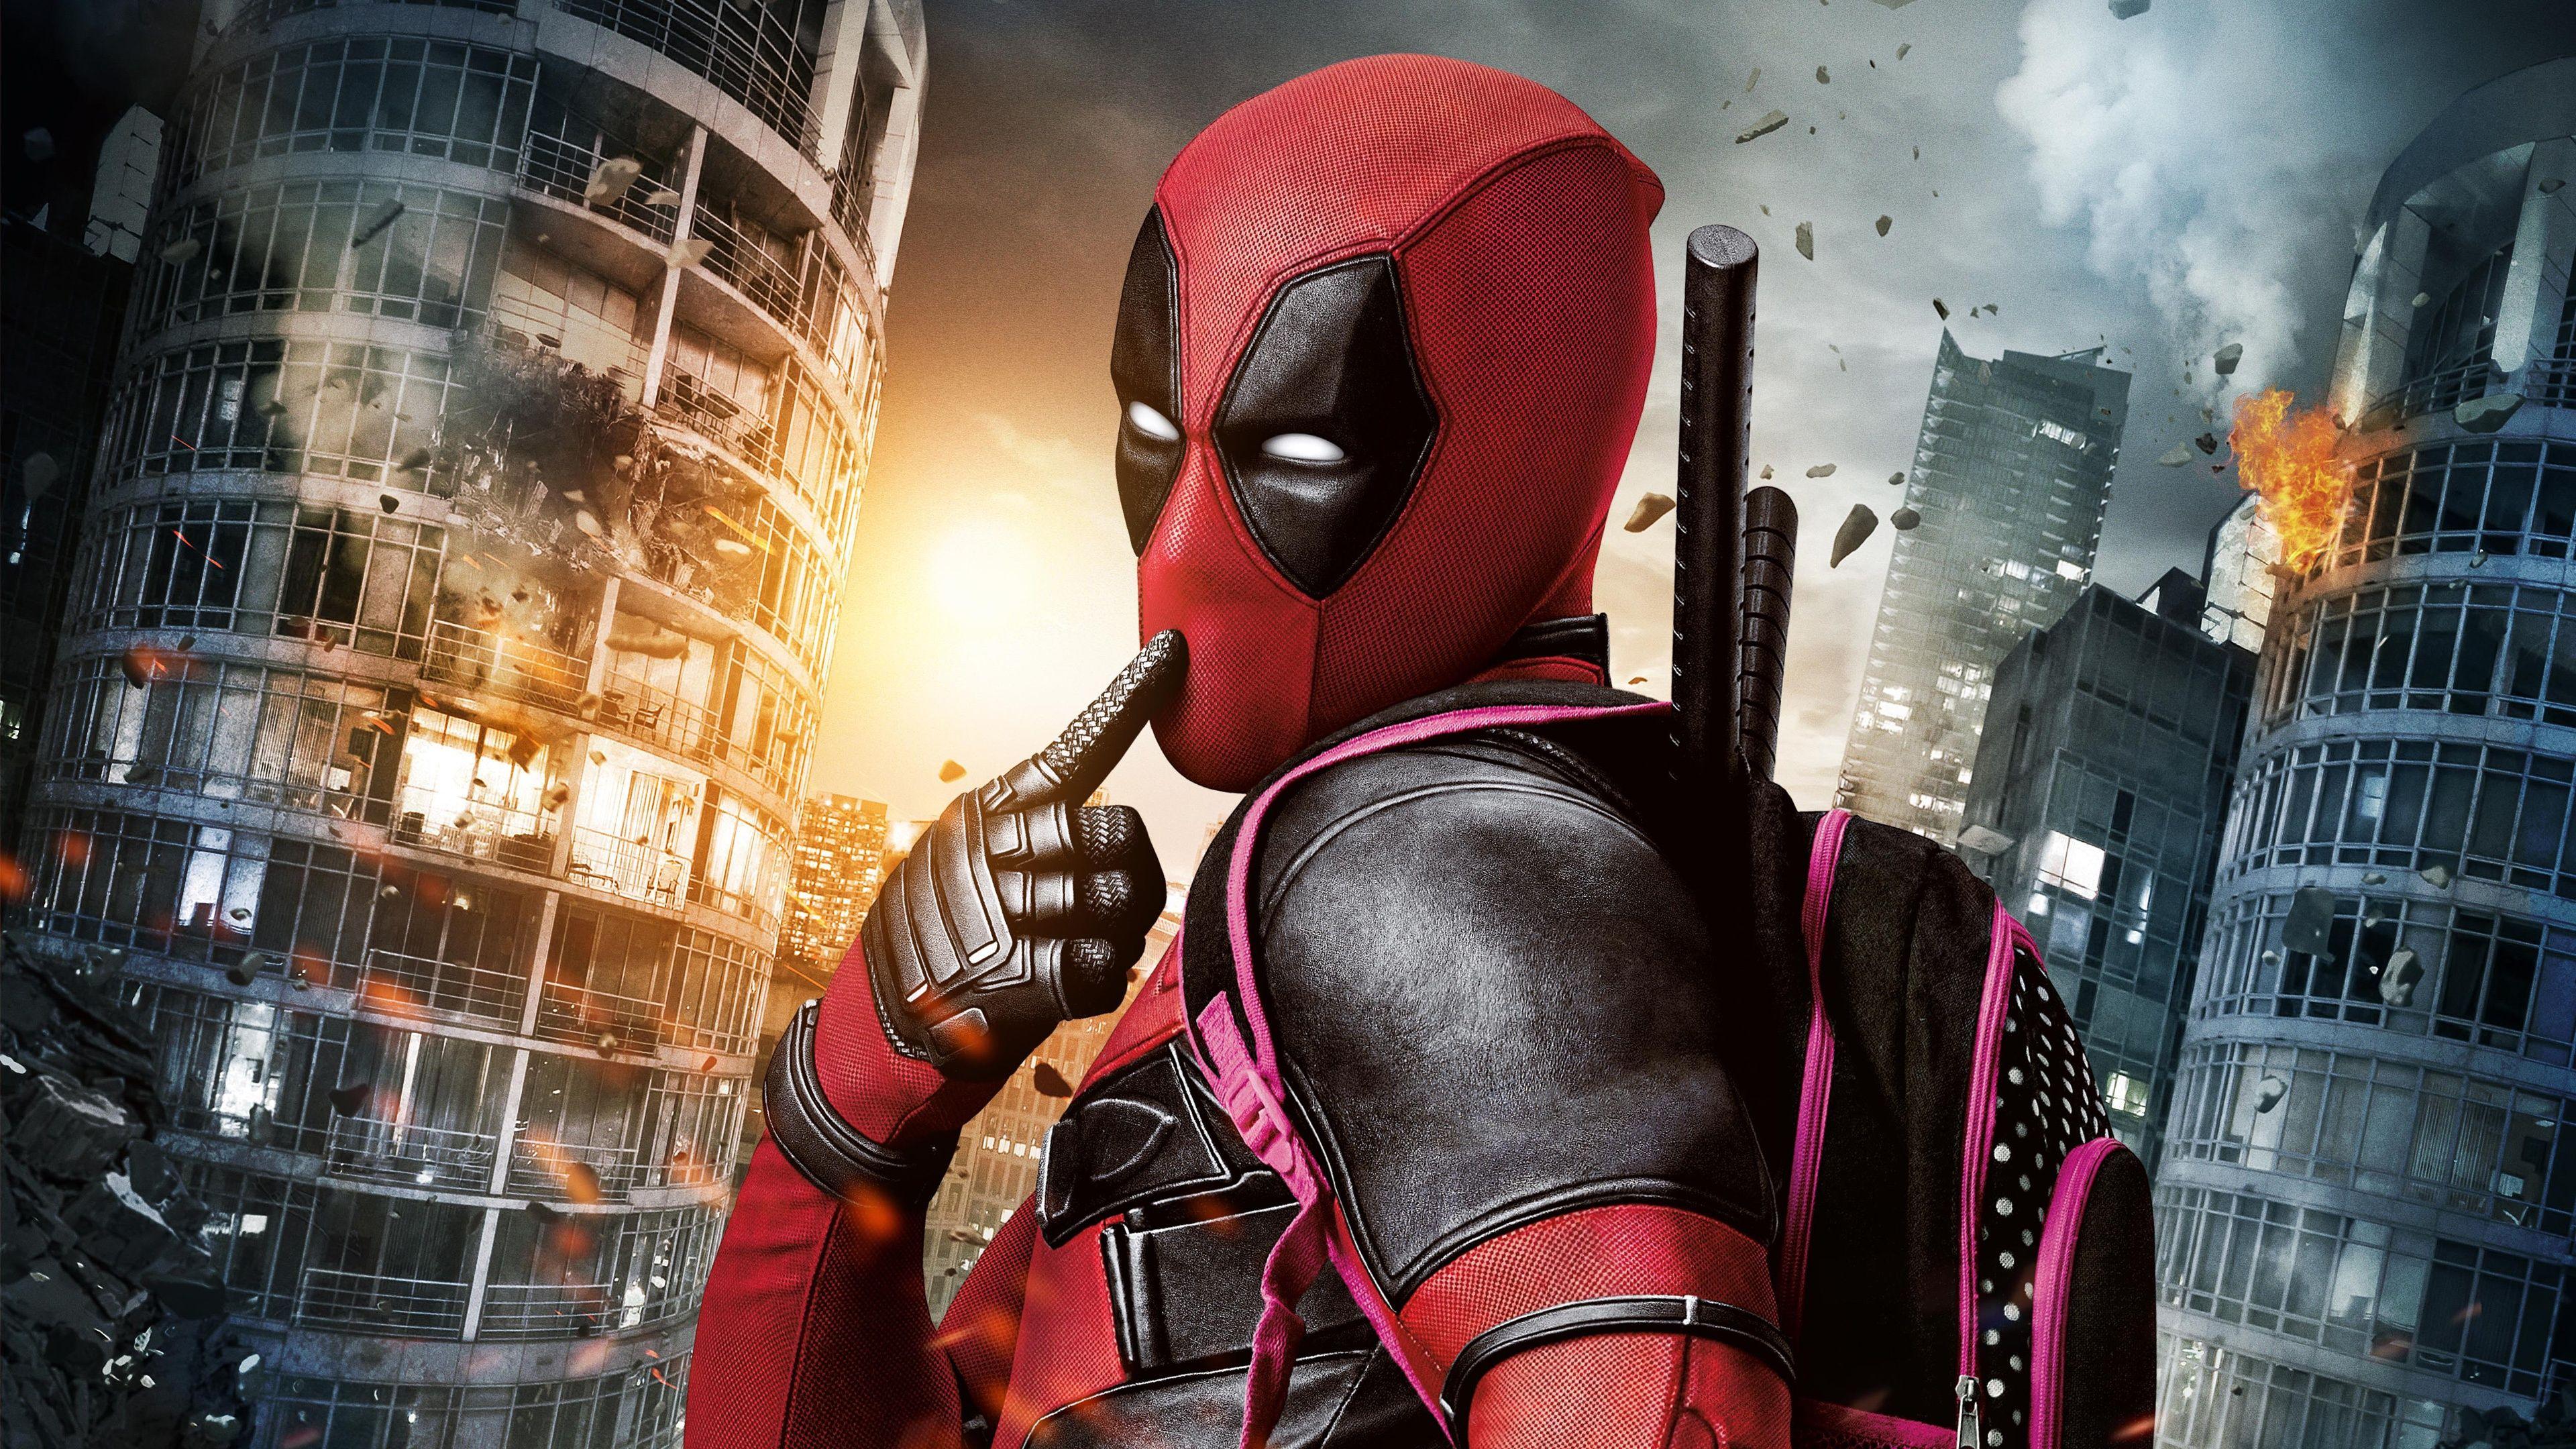 Deadpool Movie Wallpapers   Top Deadpool Movie Backgrounds 3840x2160